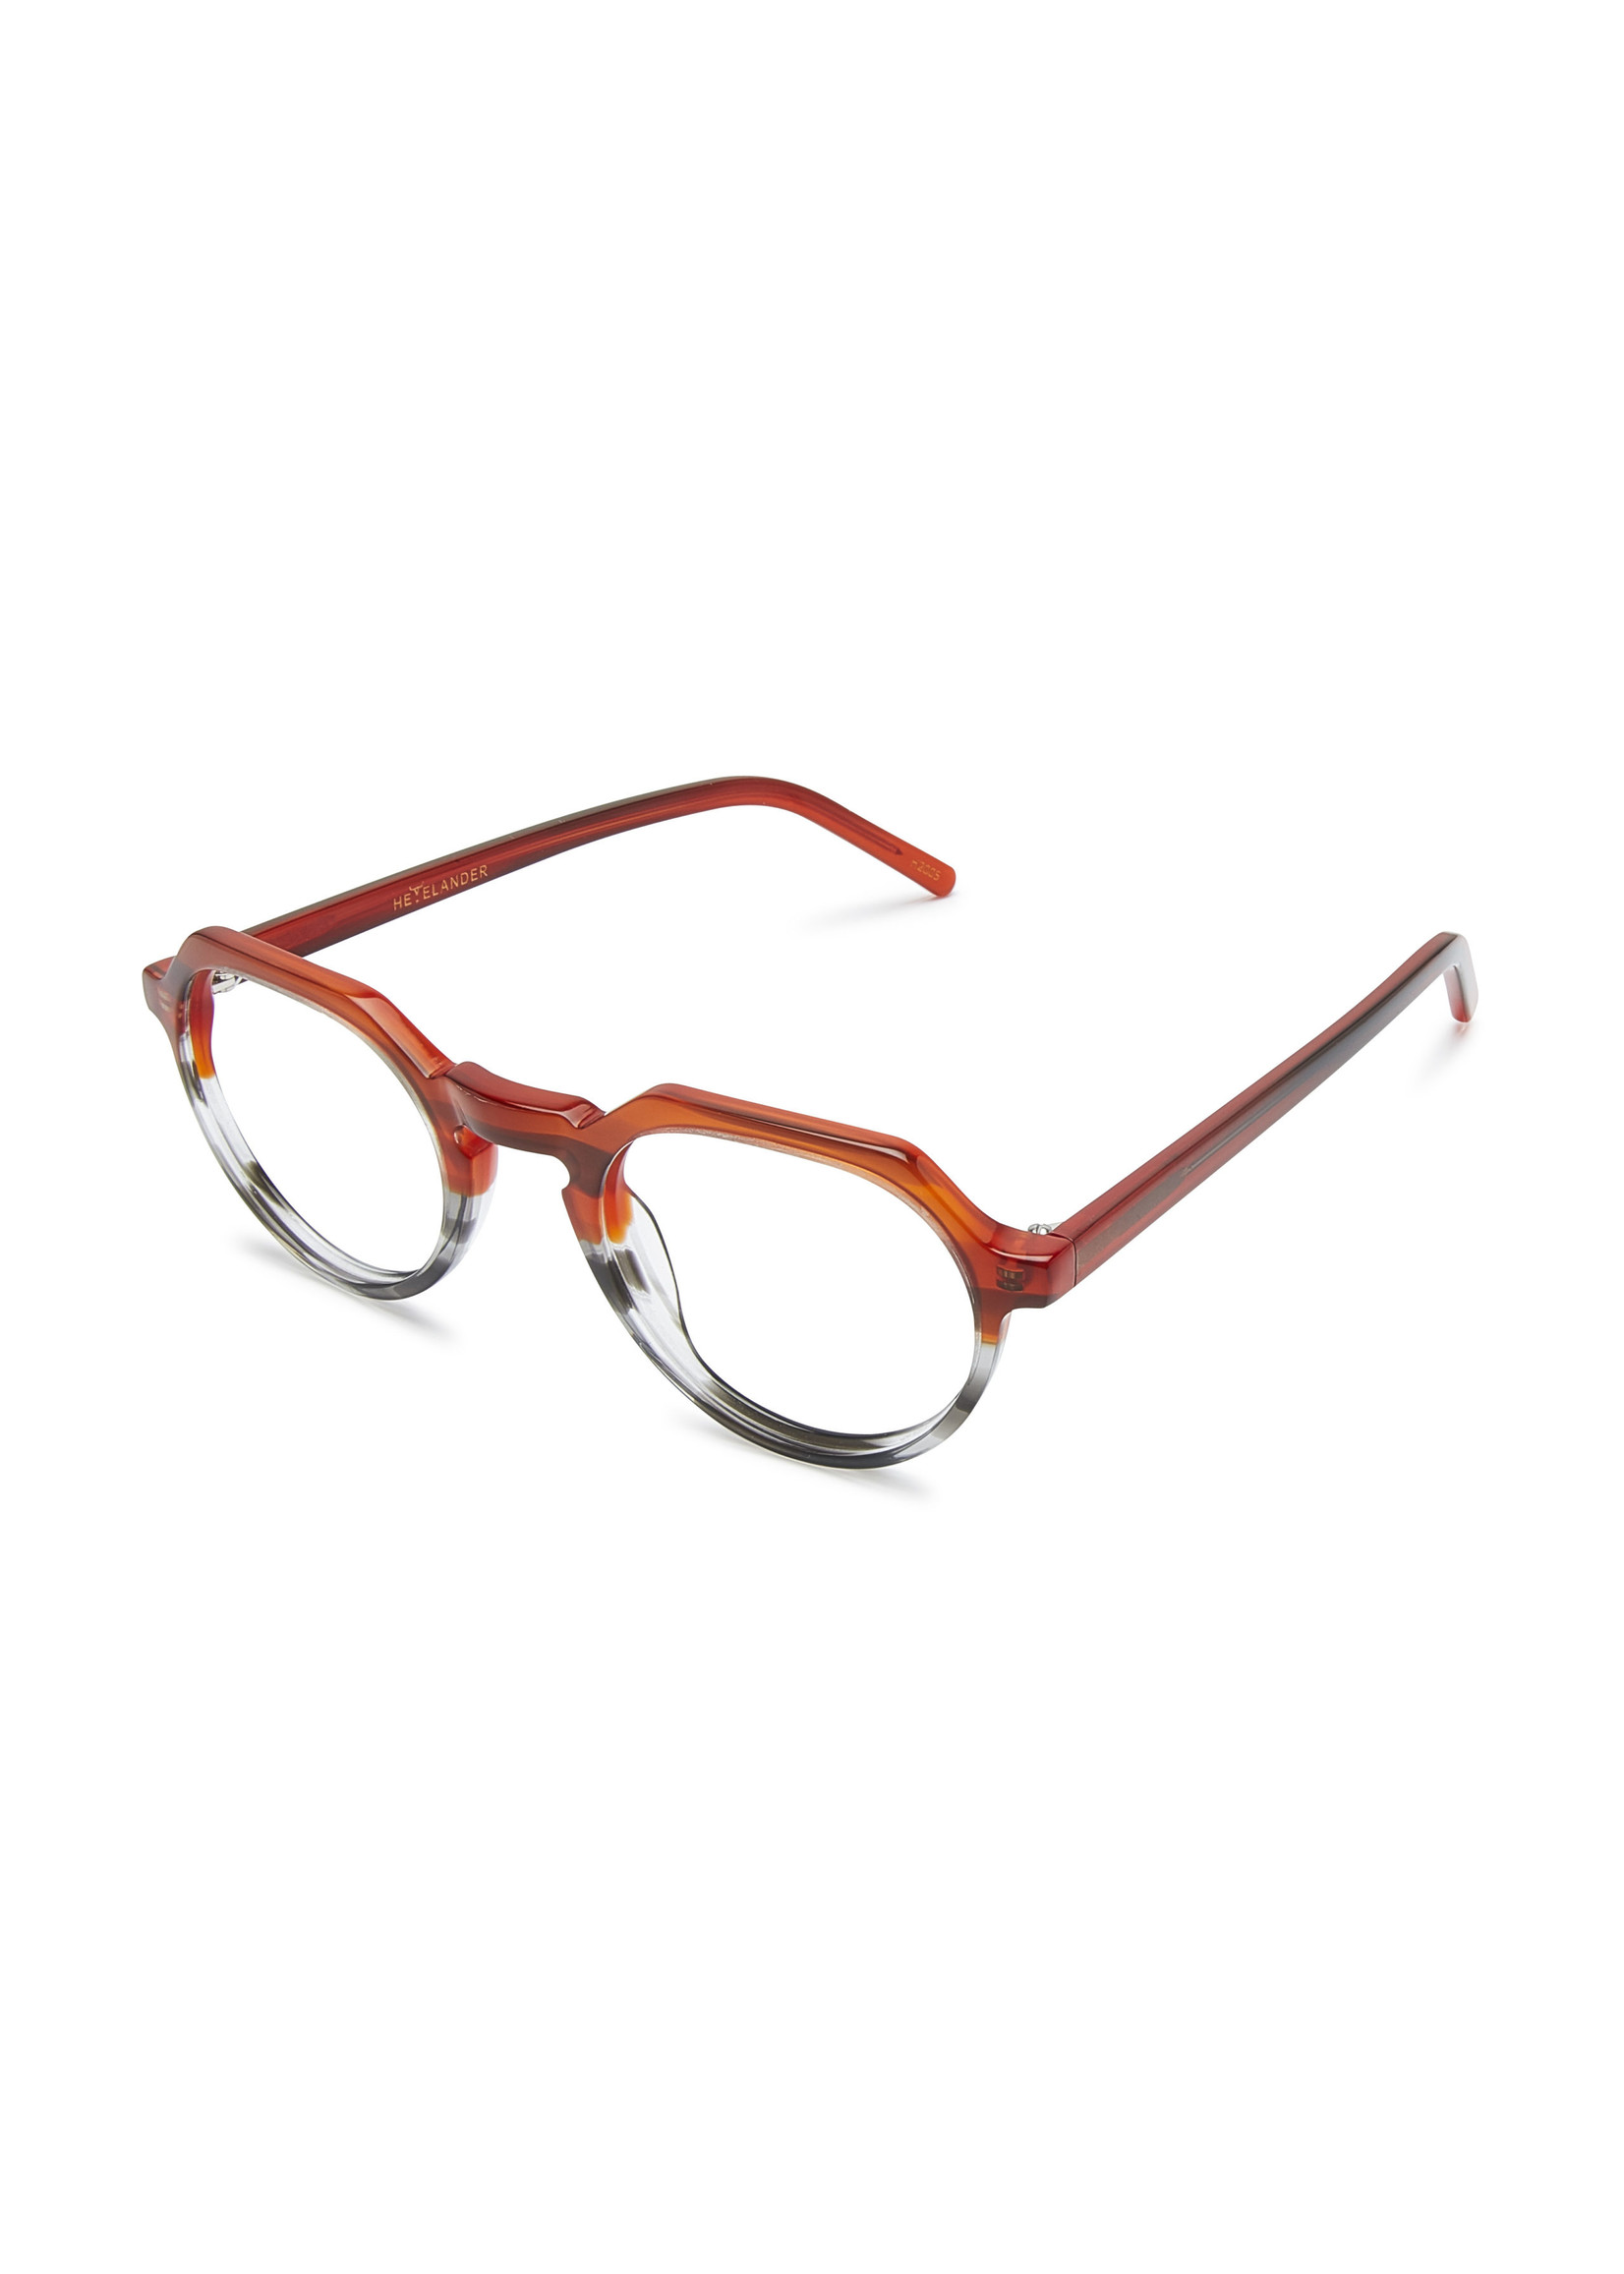 Heyelander Design Brillen  Heyelander Desigh Leesbril Gregory Maroon to Havanna